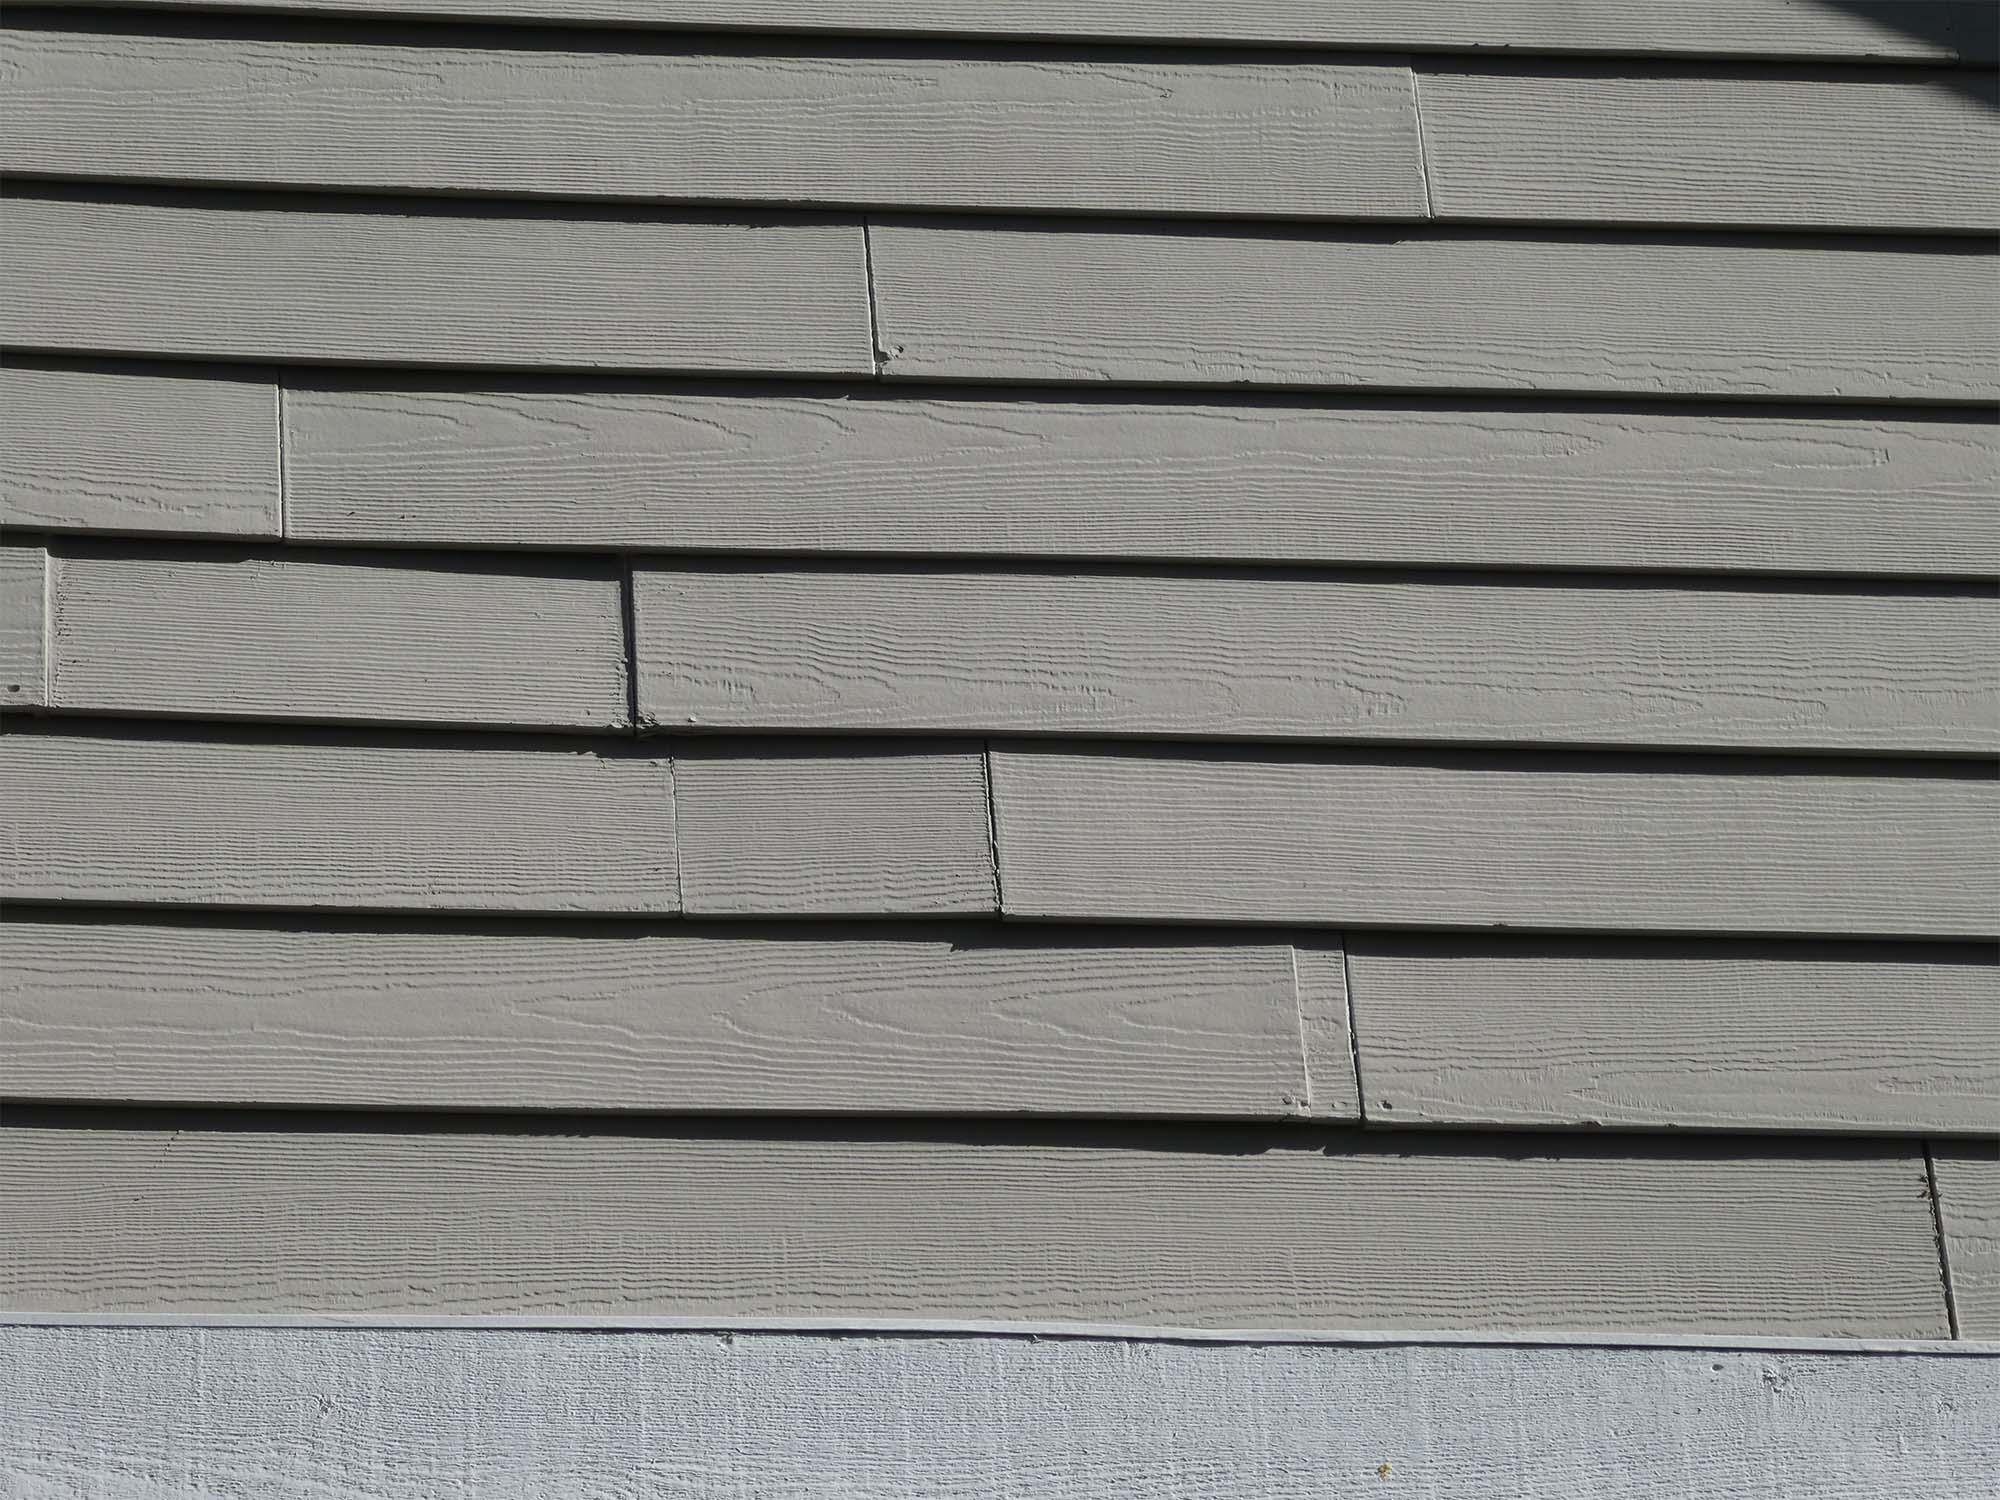 Hardie Siding Improper Install Contractors